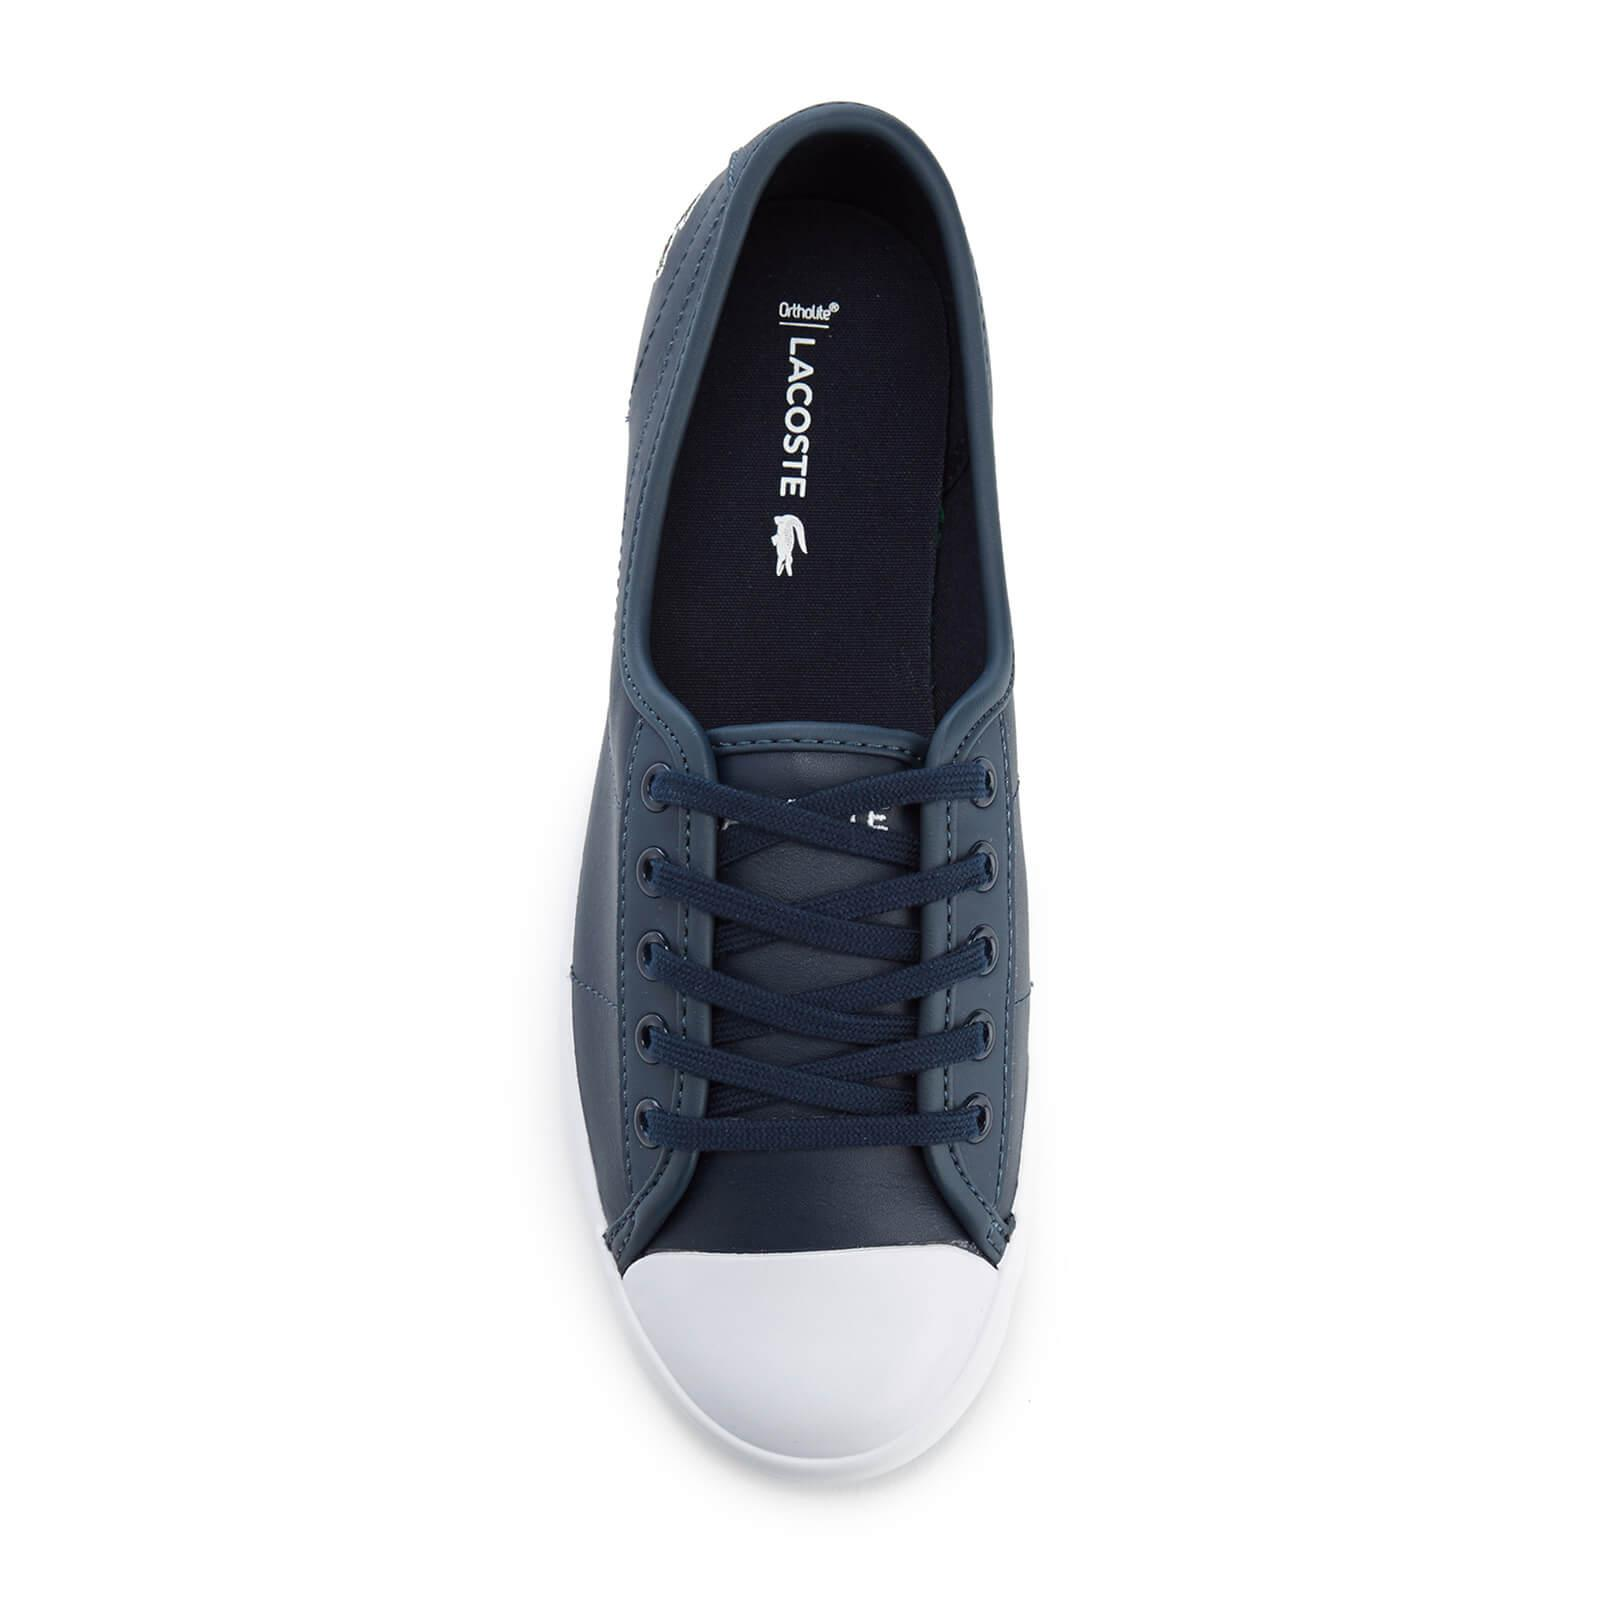 5498fe902d02 Lacoste - Blue Ziane Bl 1 Leather Lace Up Pumps - Lyst. View fullscreen